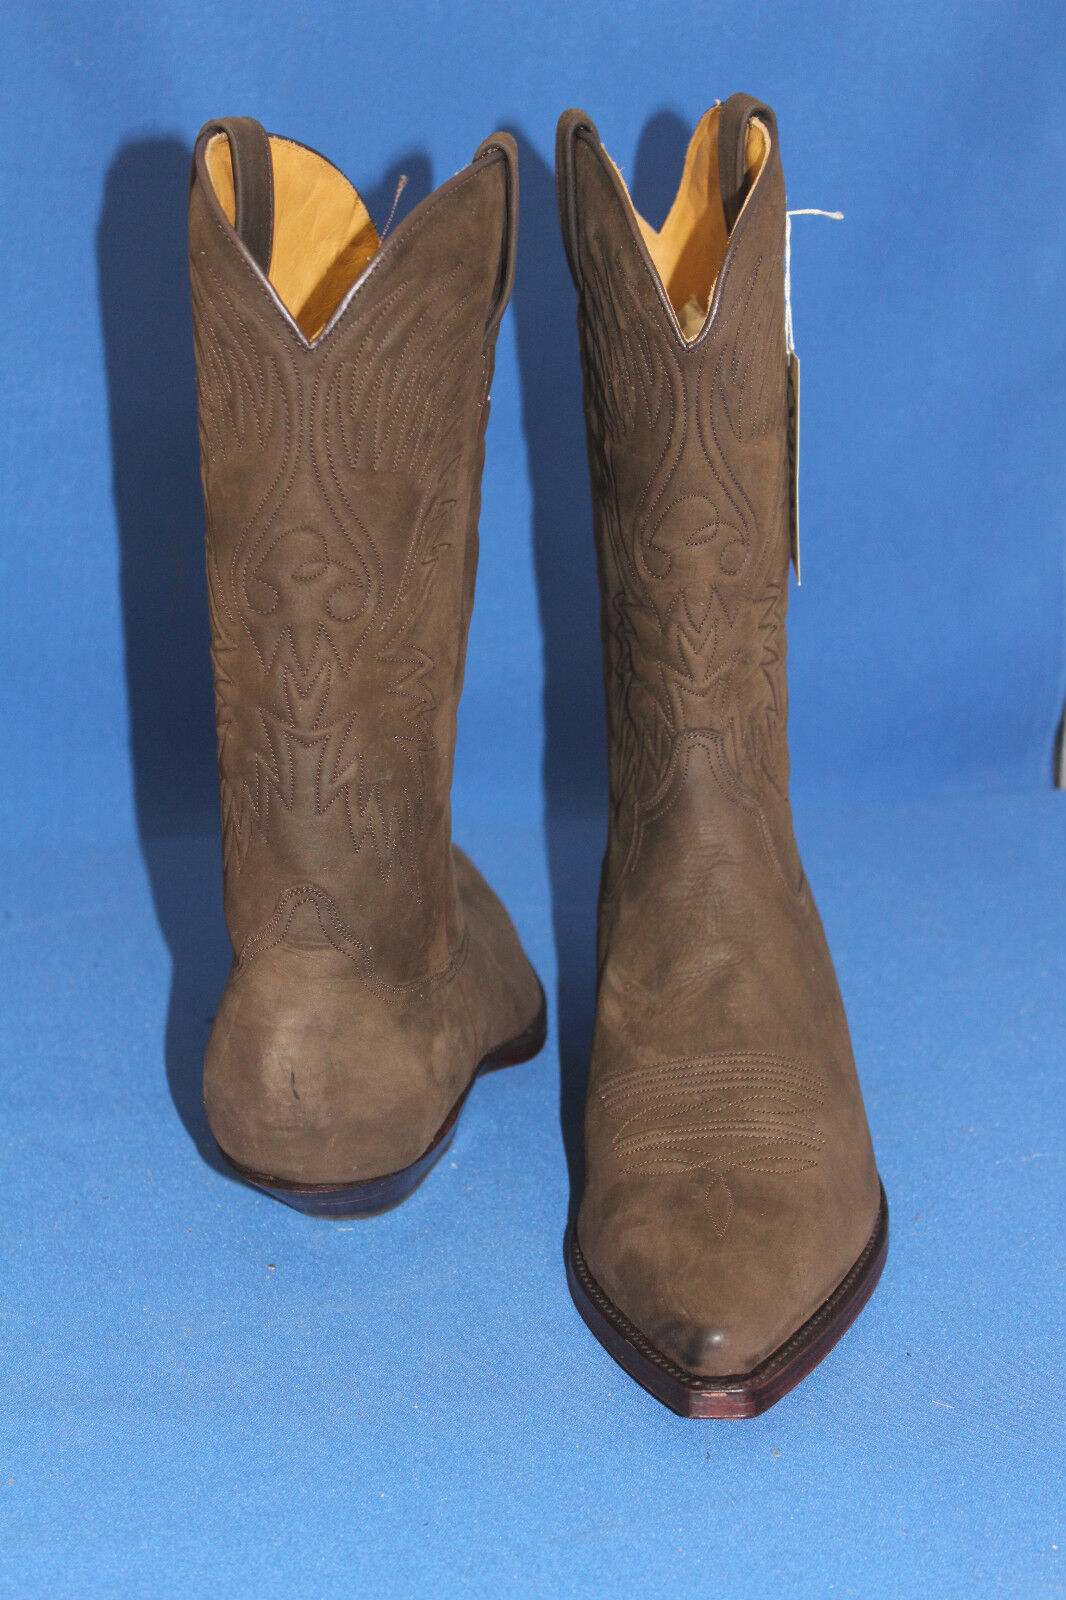 Buffalo Vidal Stivali Cowboy Stivali Stivali Stivali Stivali Stivali Western in Pelle Nuovo Gr. 35 Marroneee 5a941f